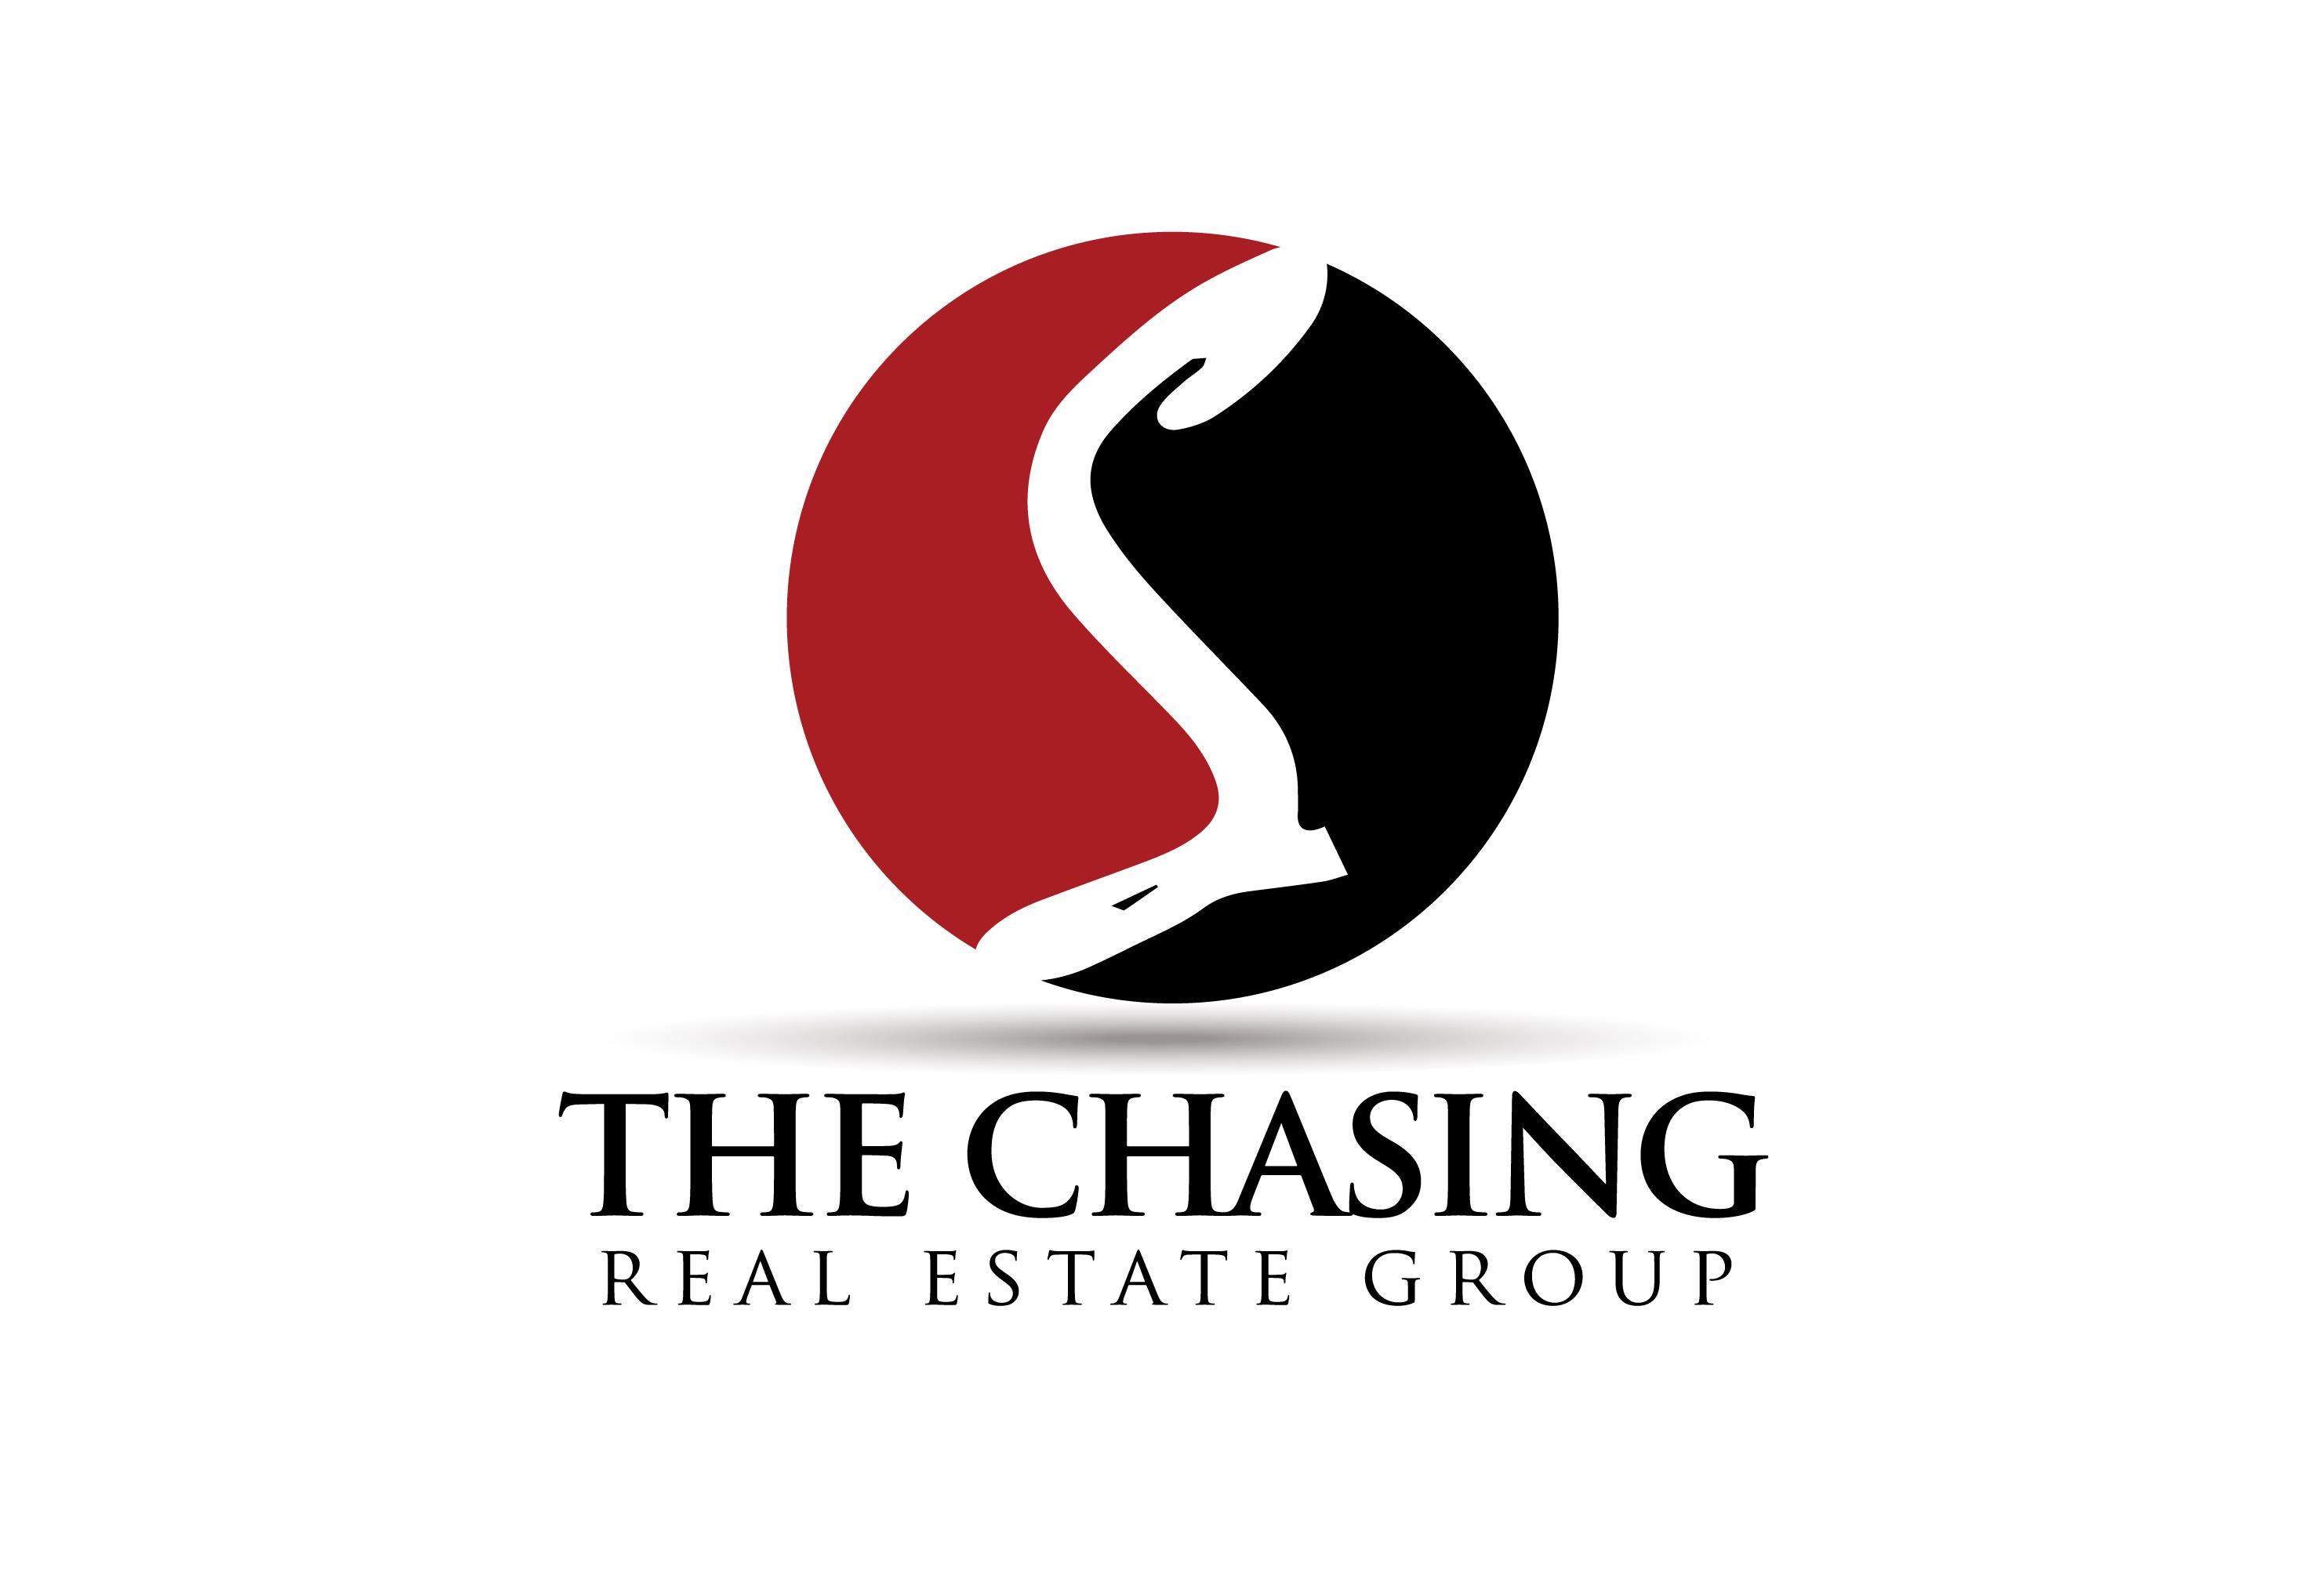 The chasing real estate group at keller williams realty the chasing real estate group biocorpaavc